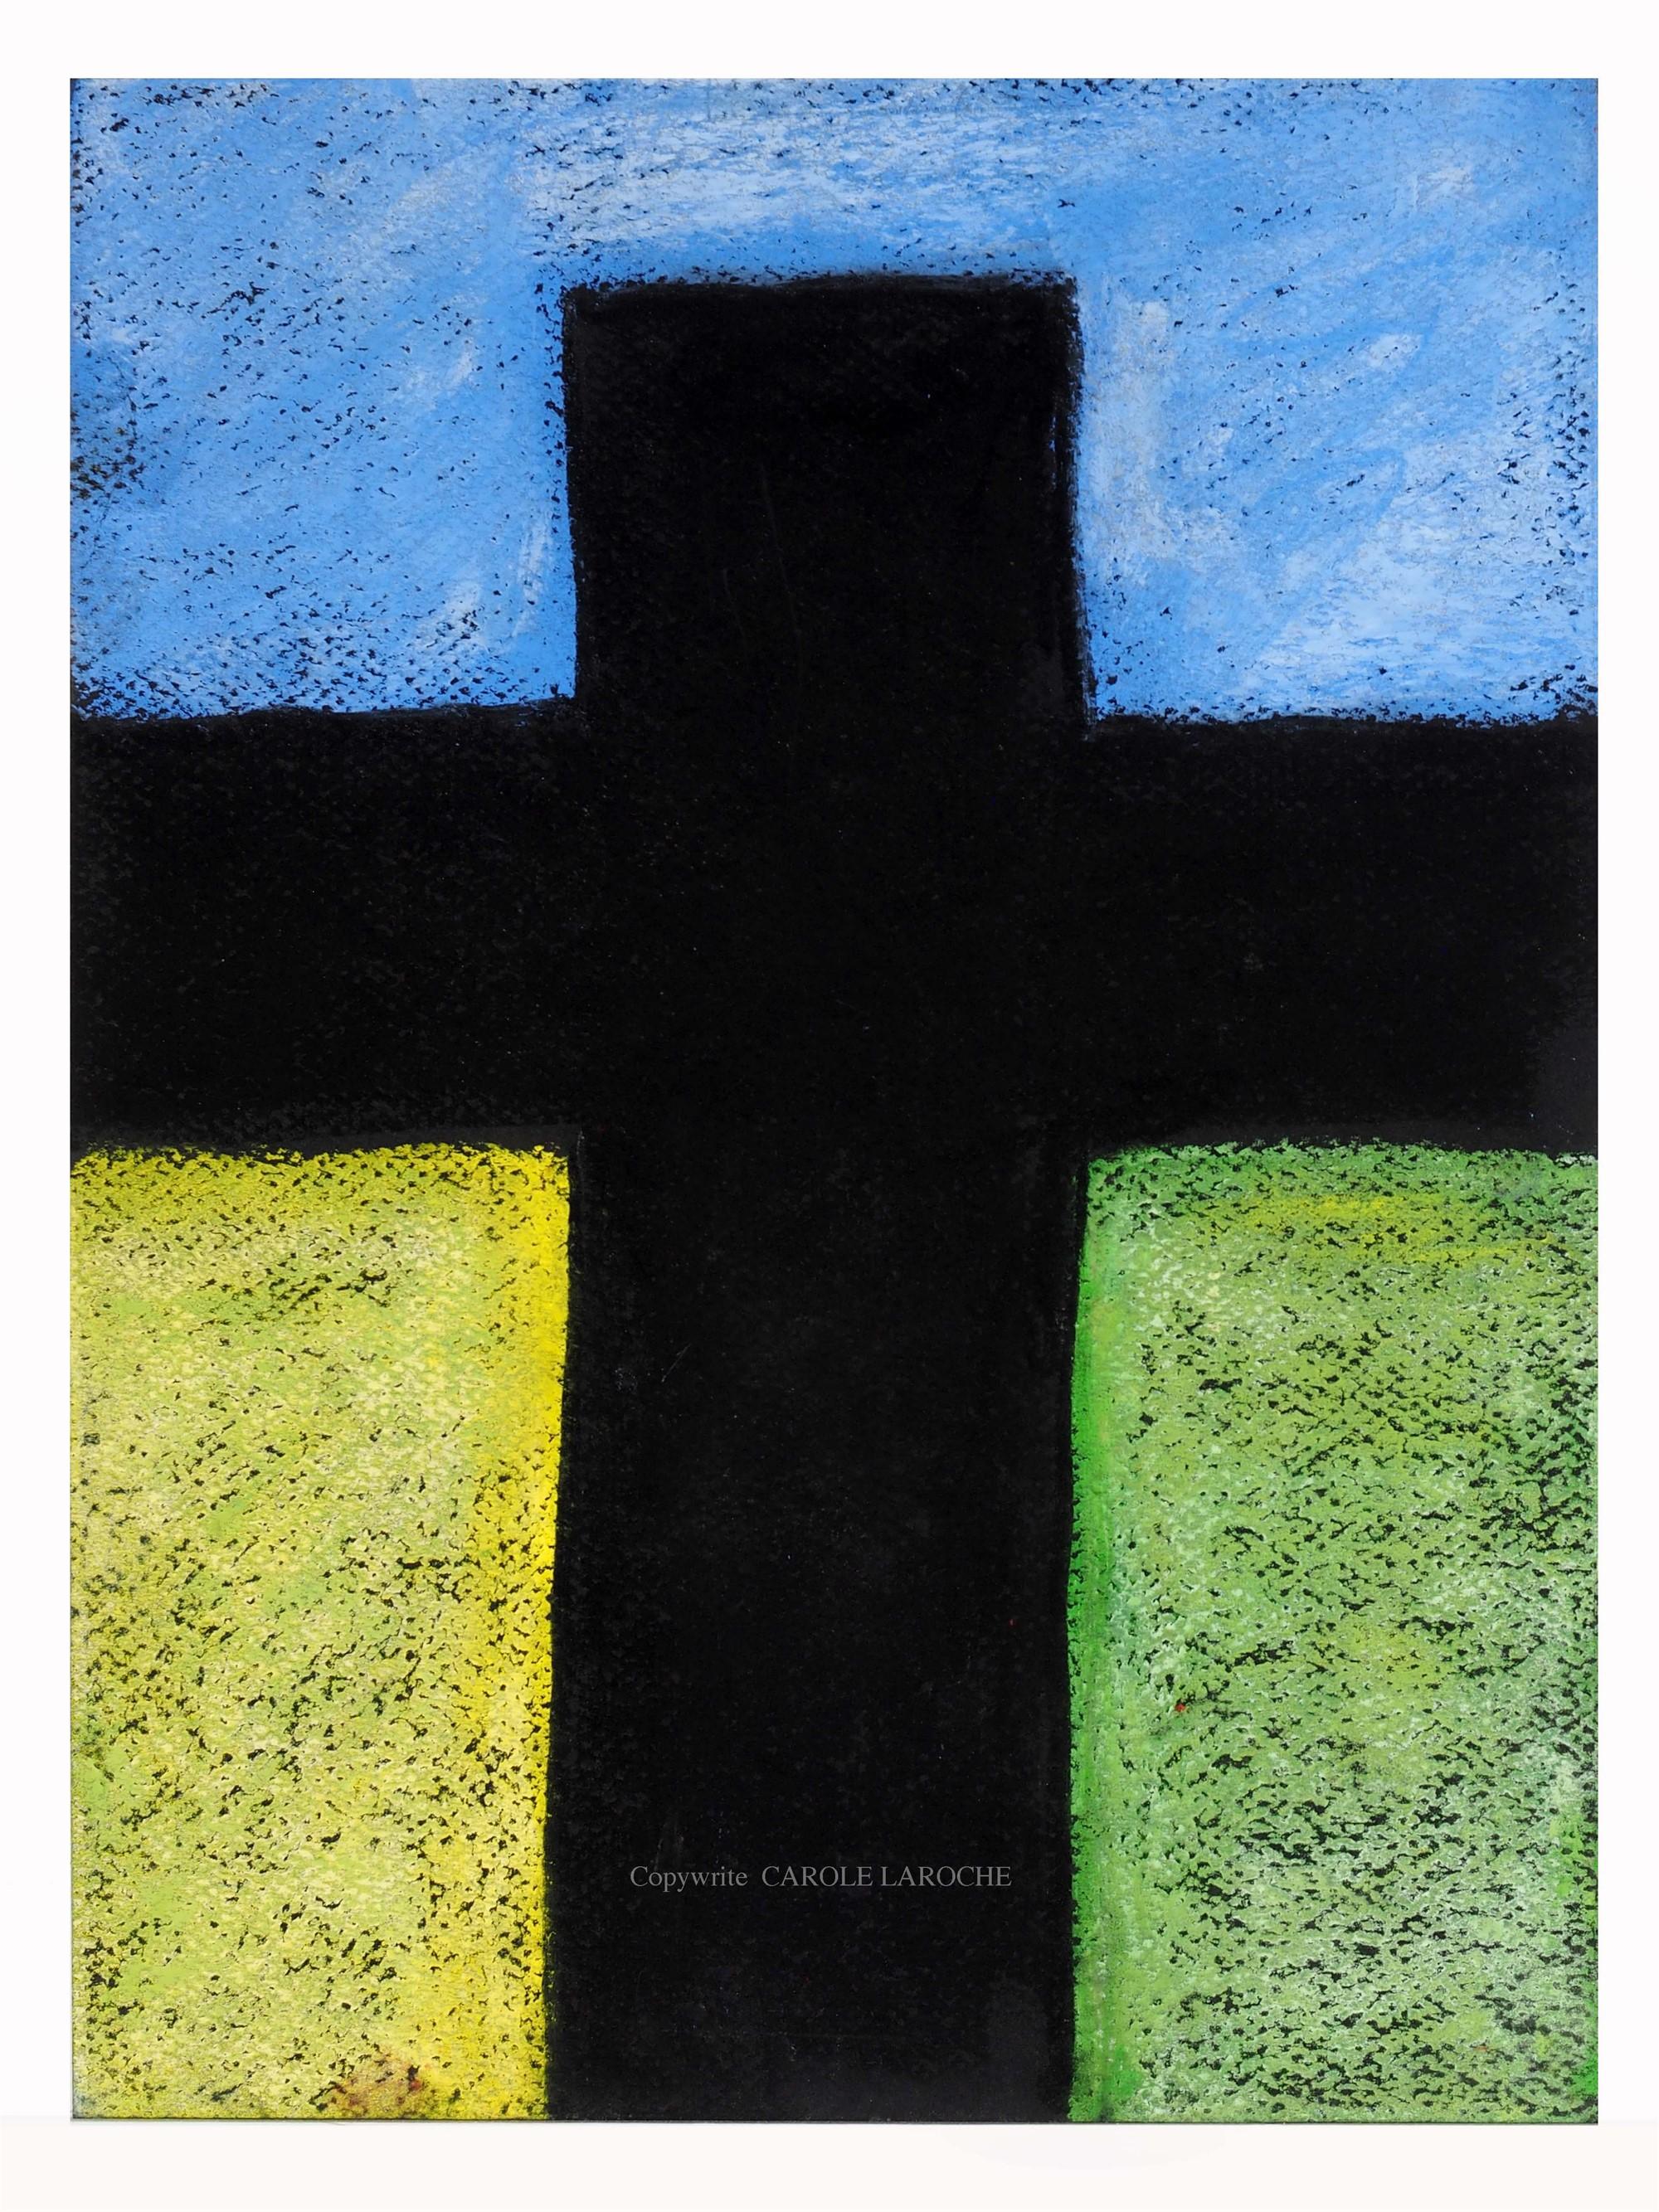 LAS CRUCES II by Carole LaRoche